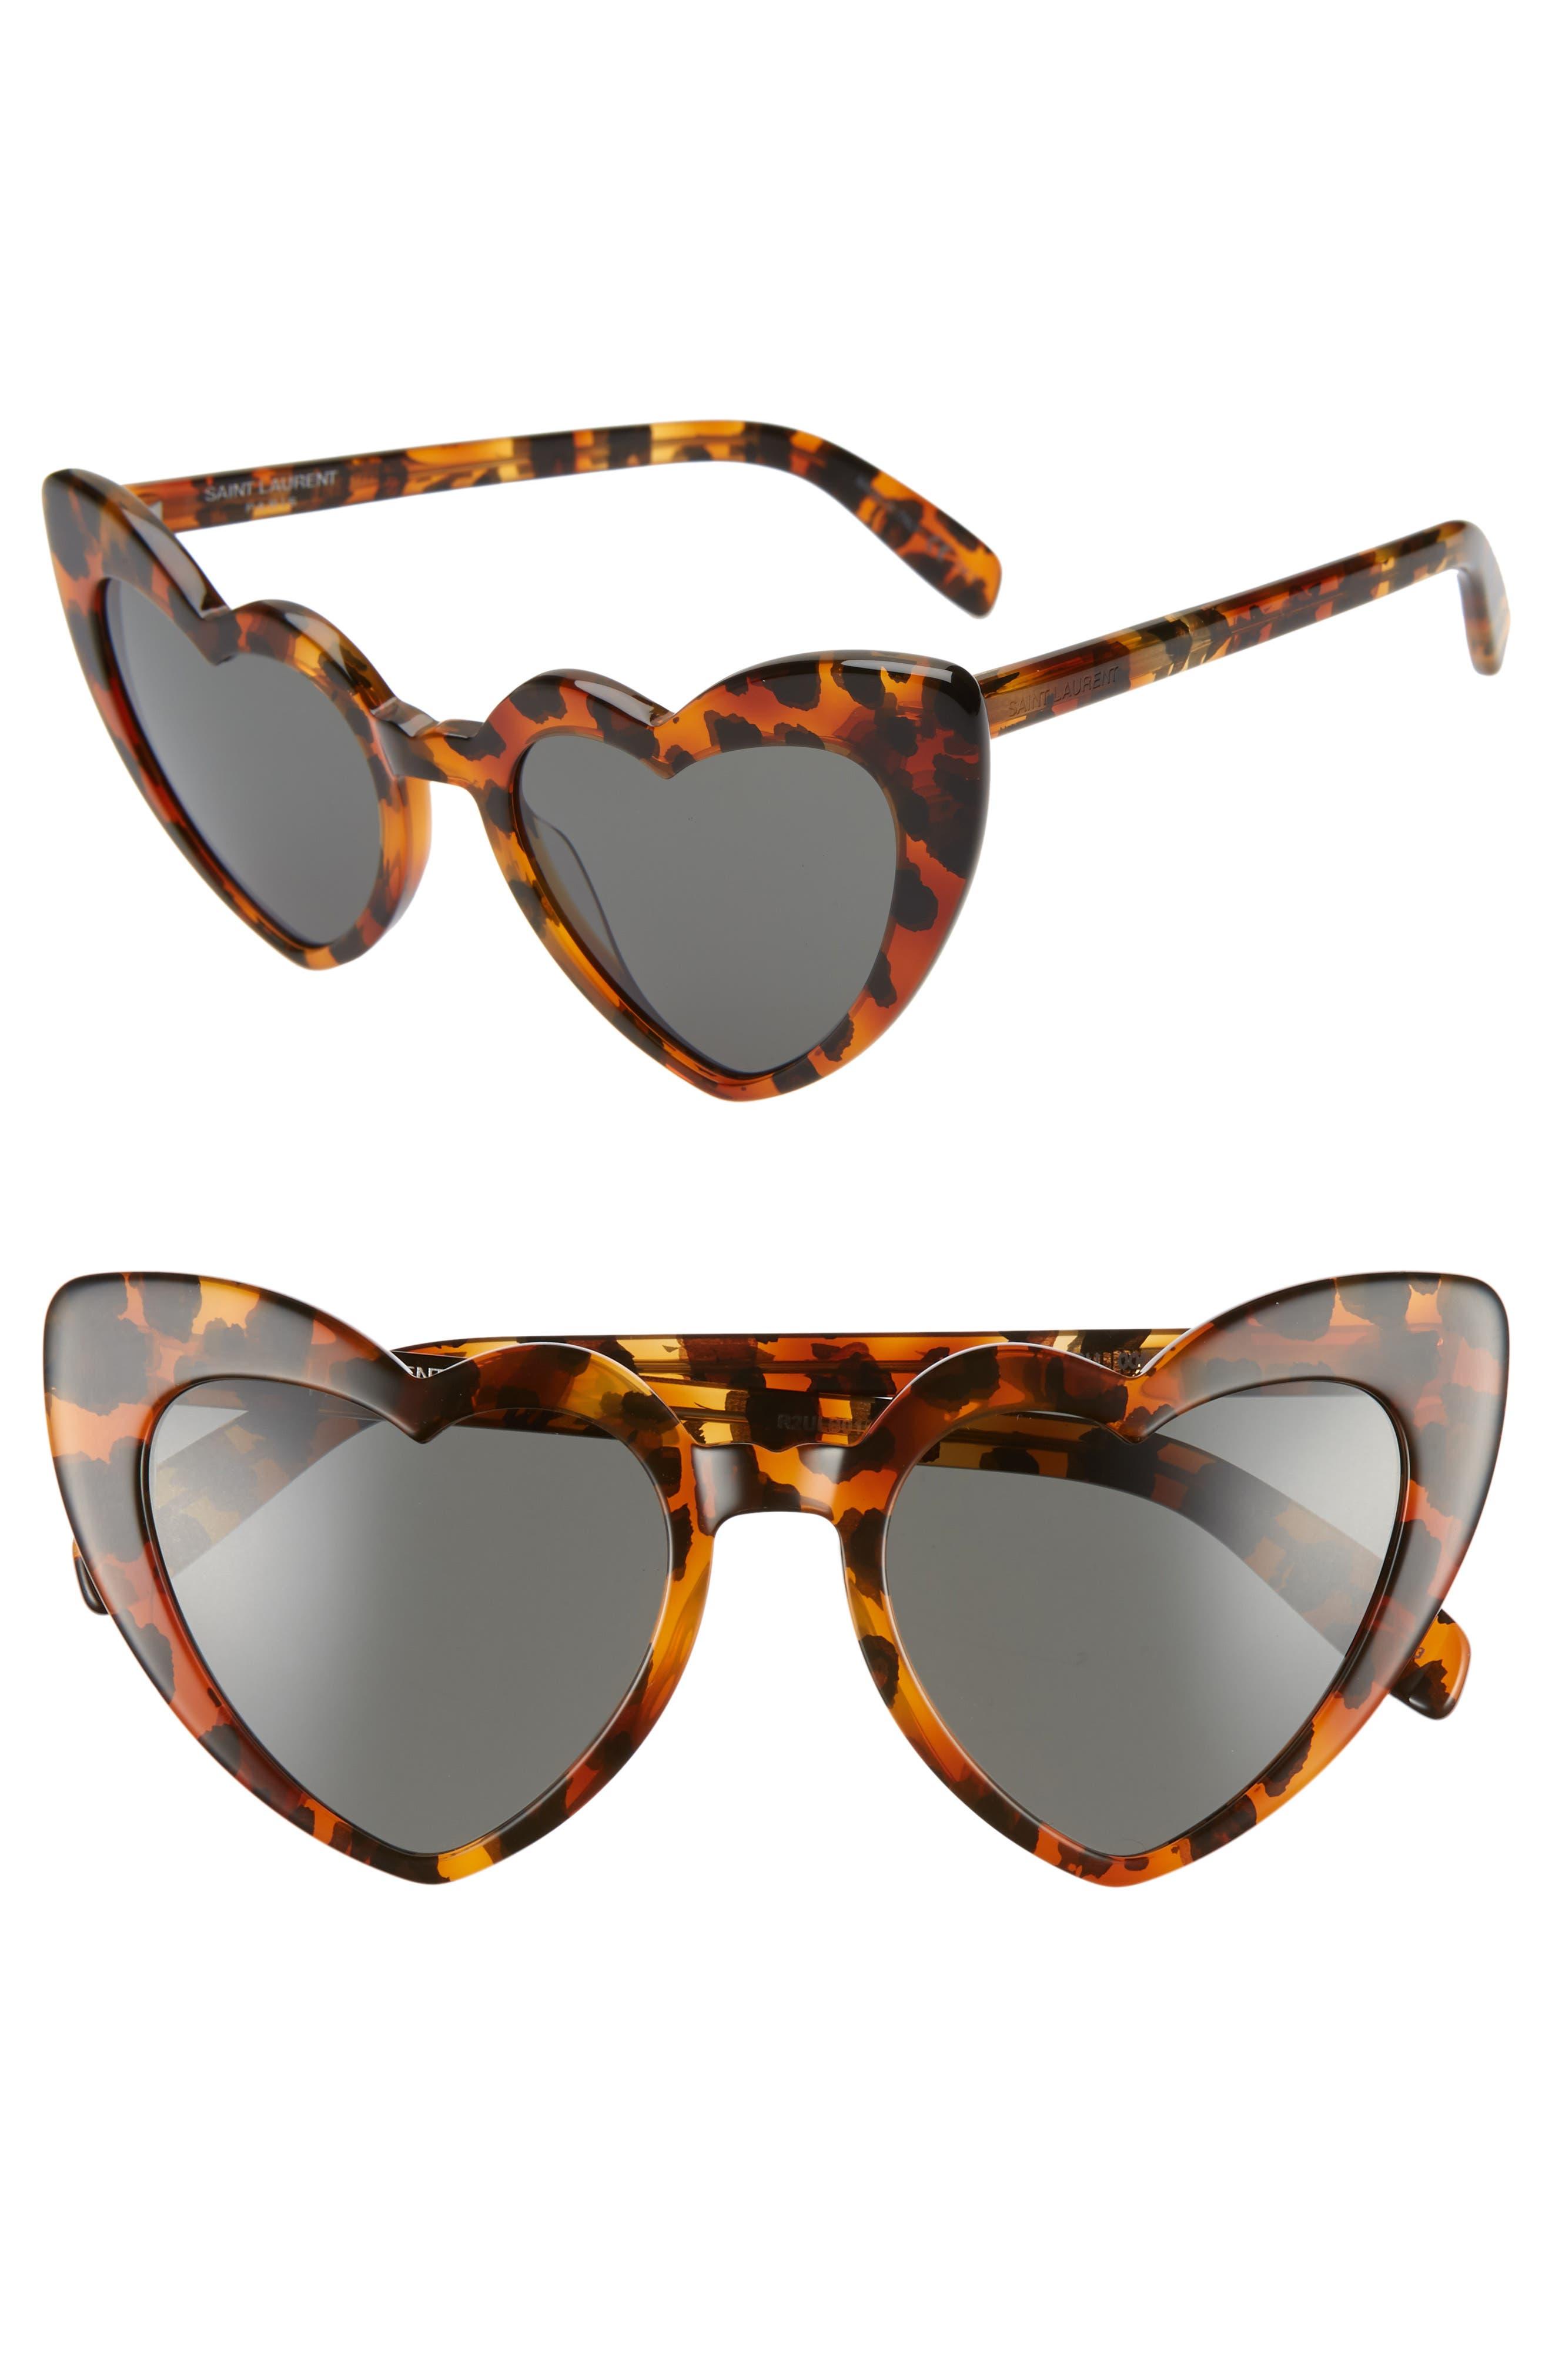 Loulou 54mm Heart Sunglasses,                         Main,                         color, LEOPARD HAVANA/ GREY